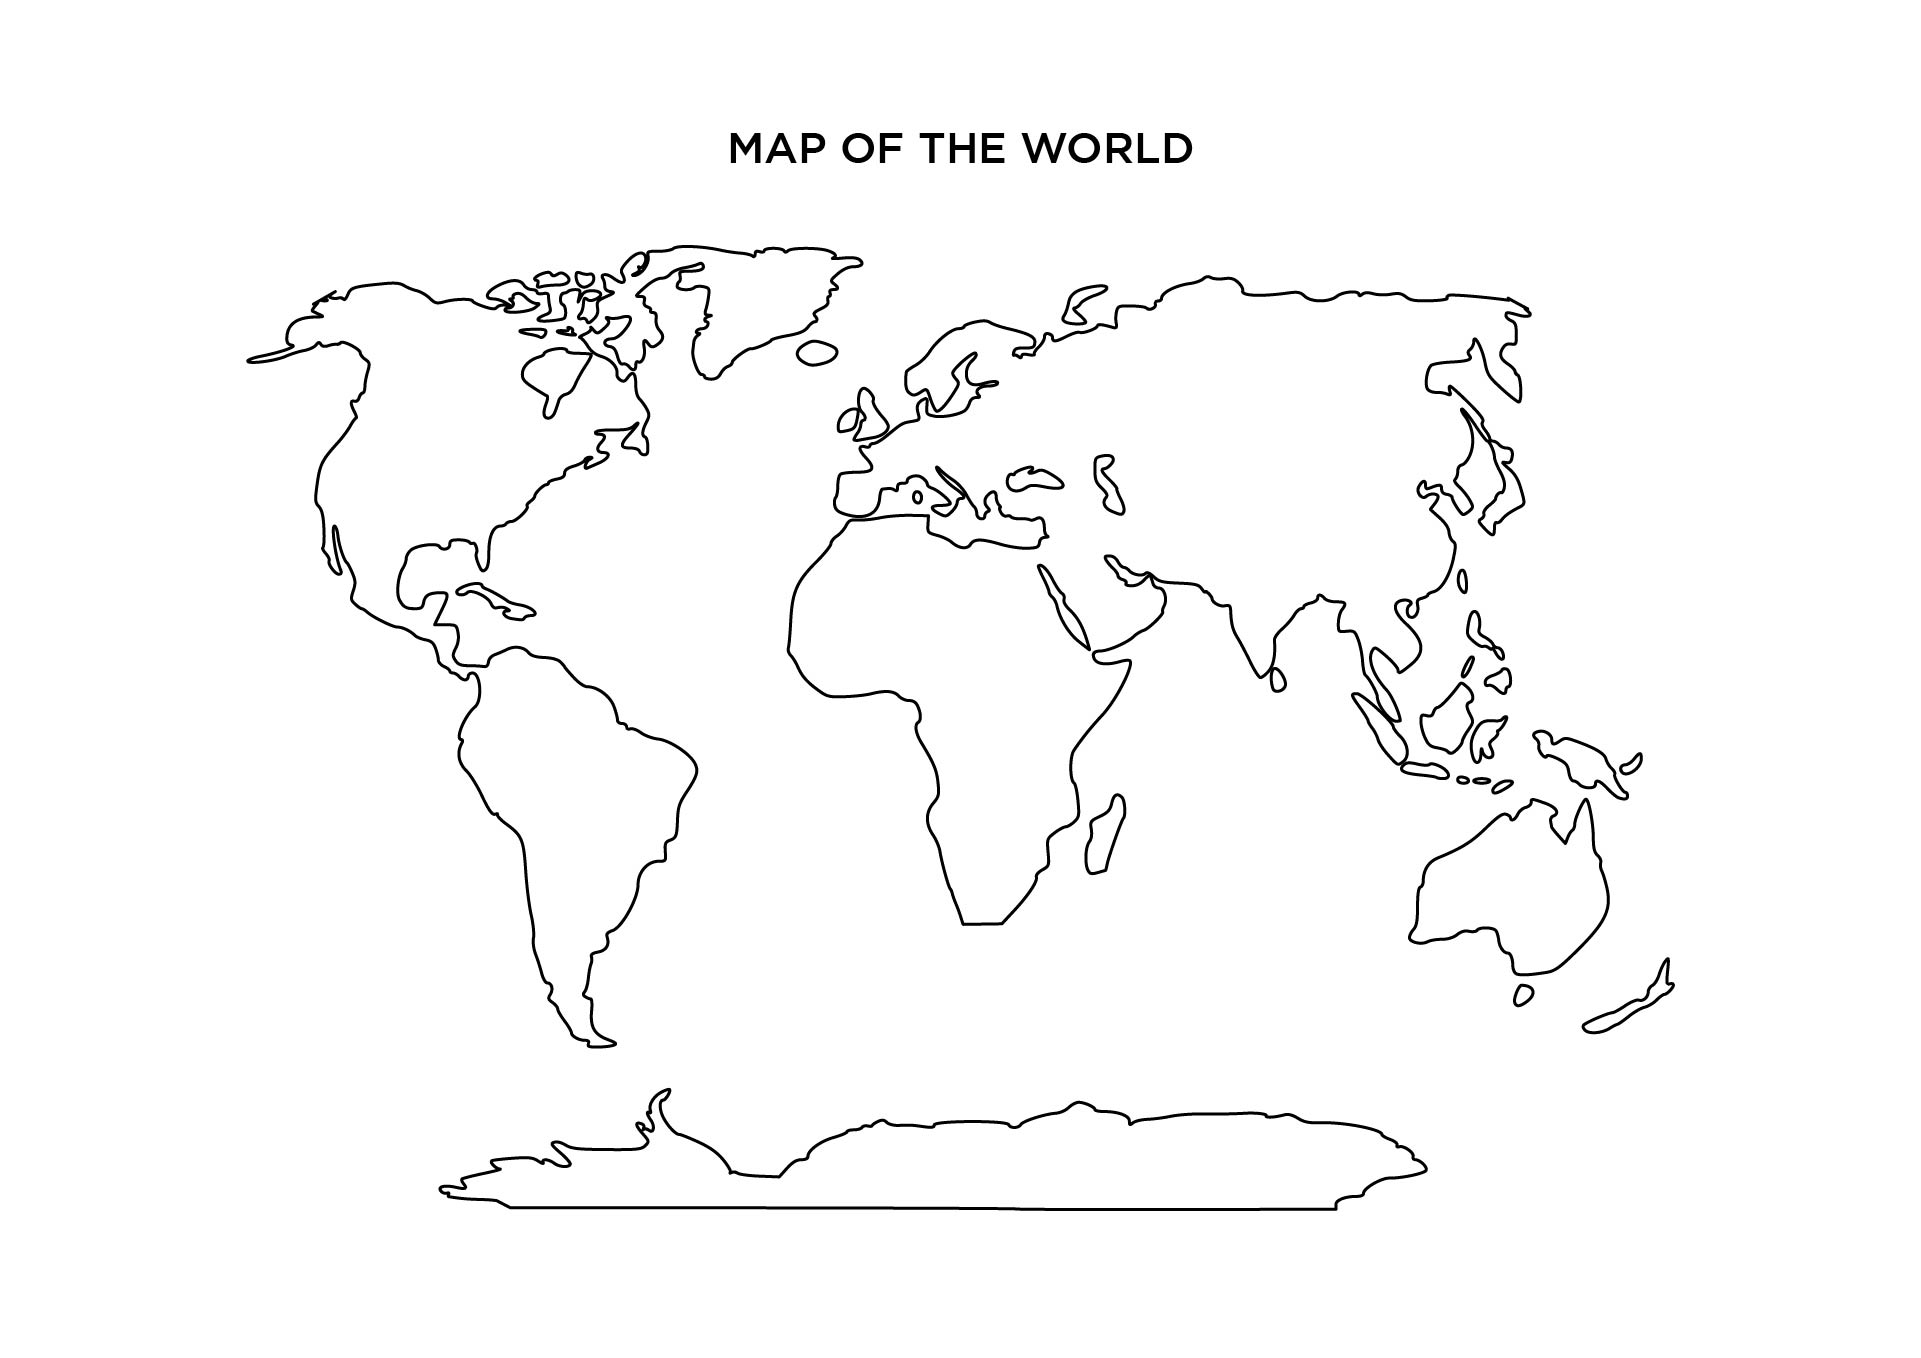 Uhádneš krajinu podľa jej obrysu?